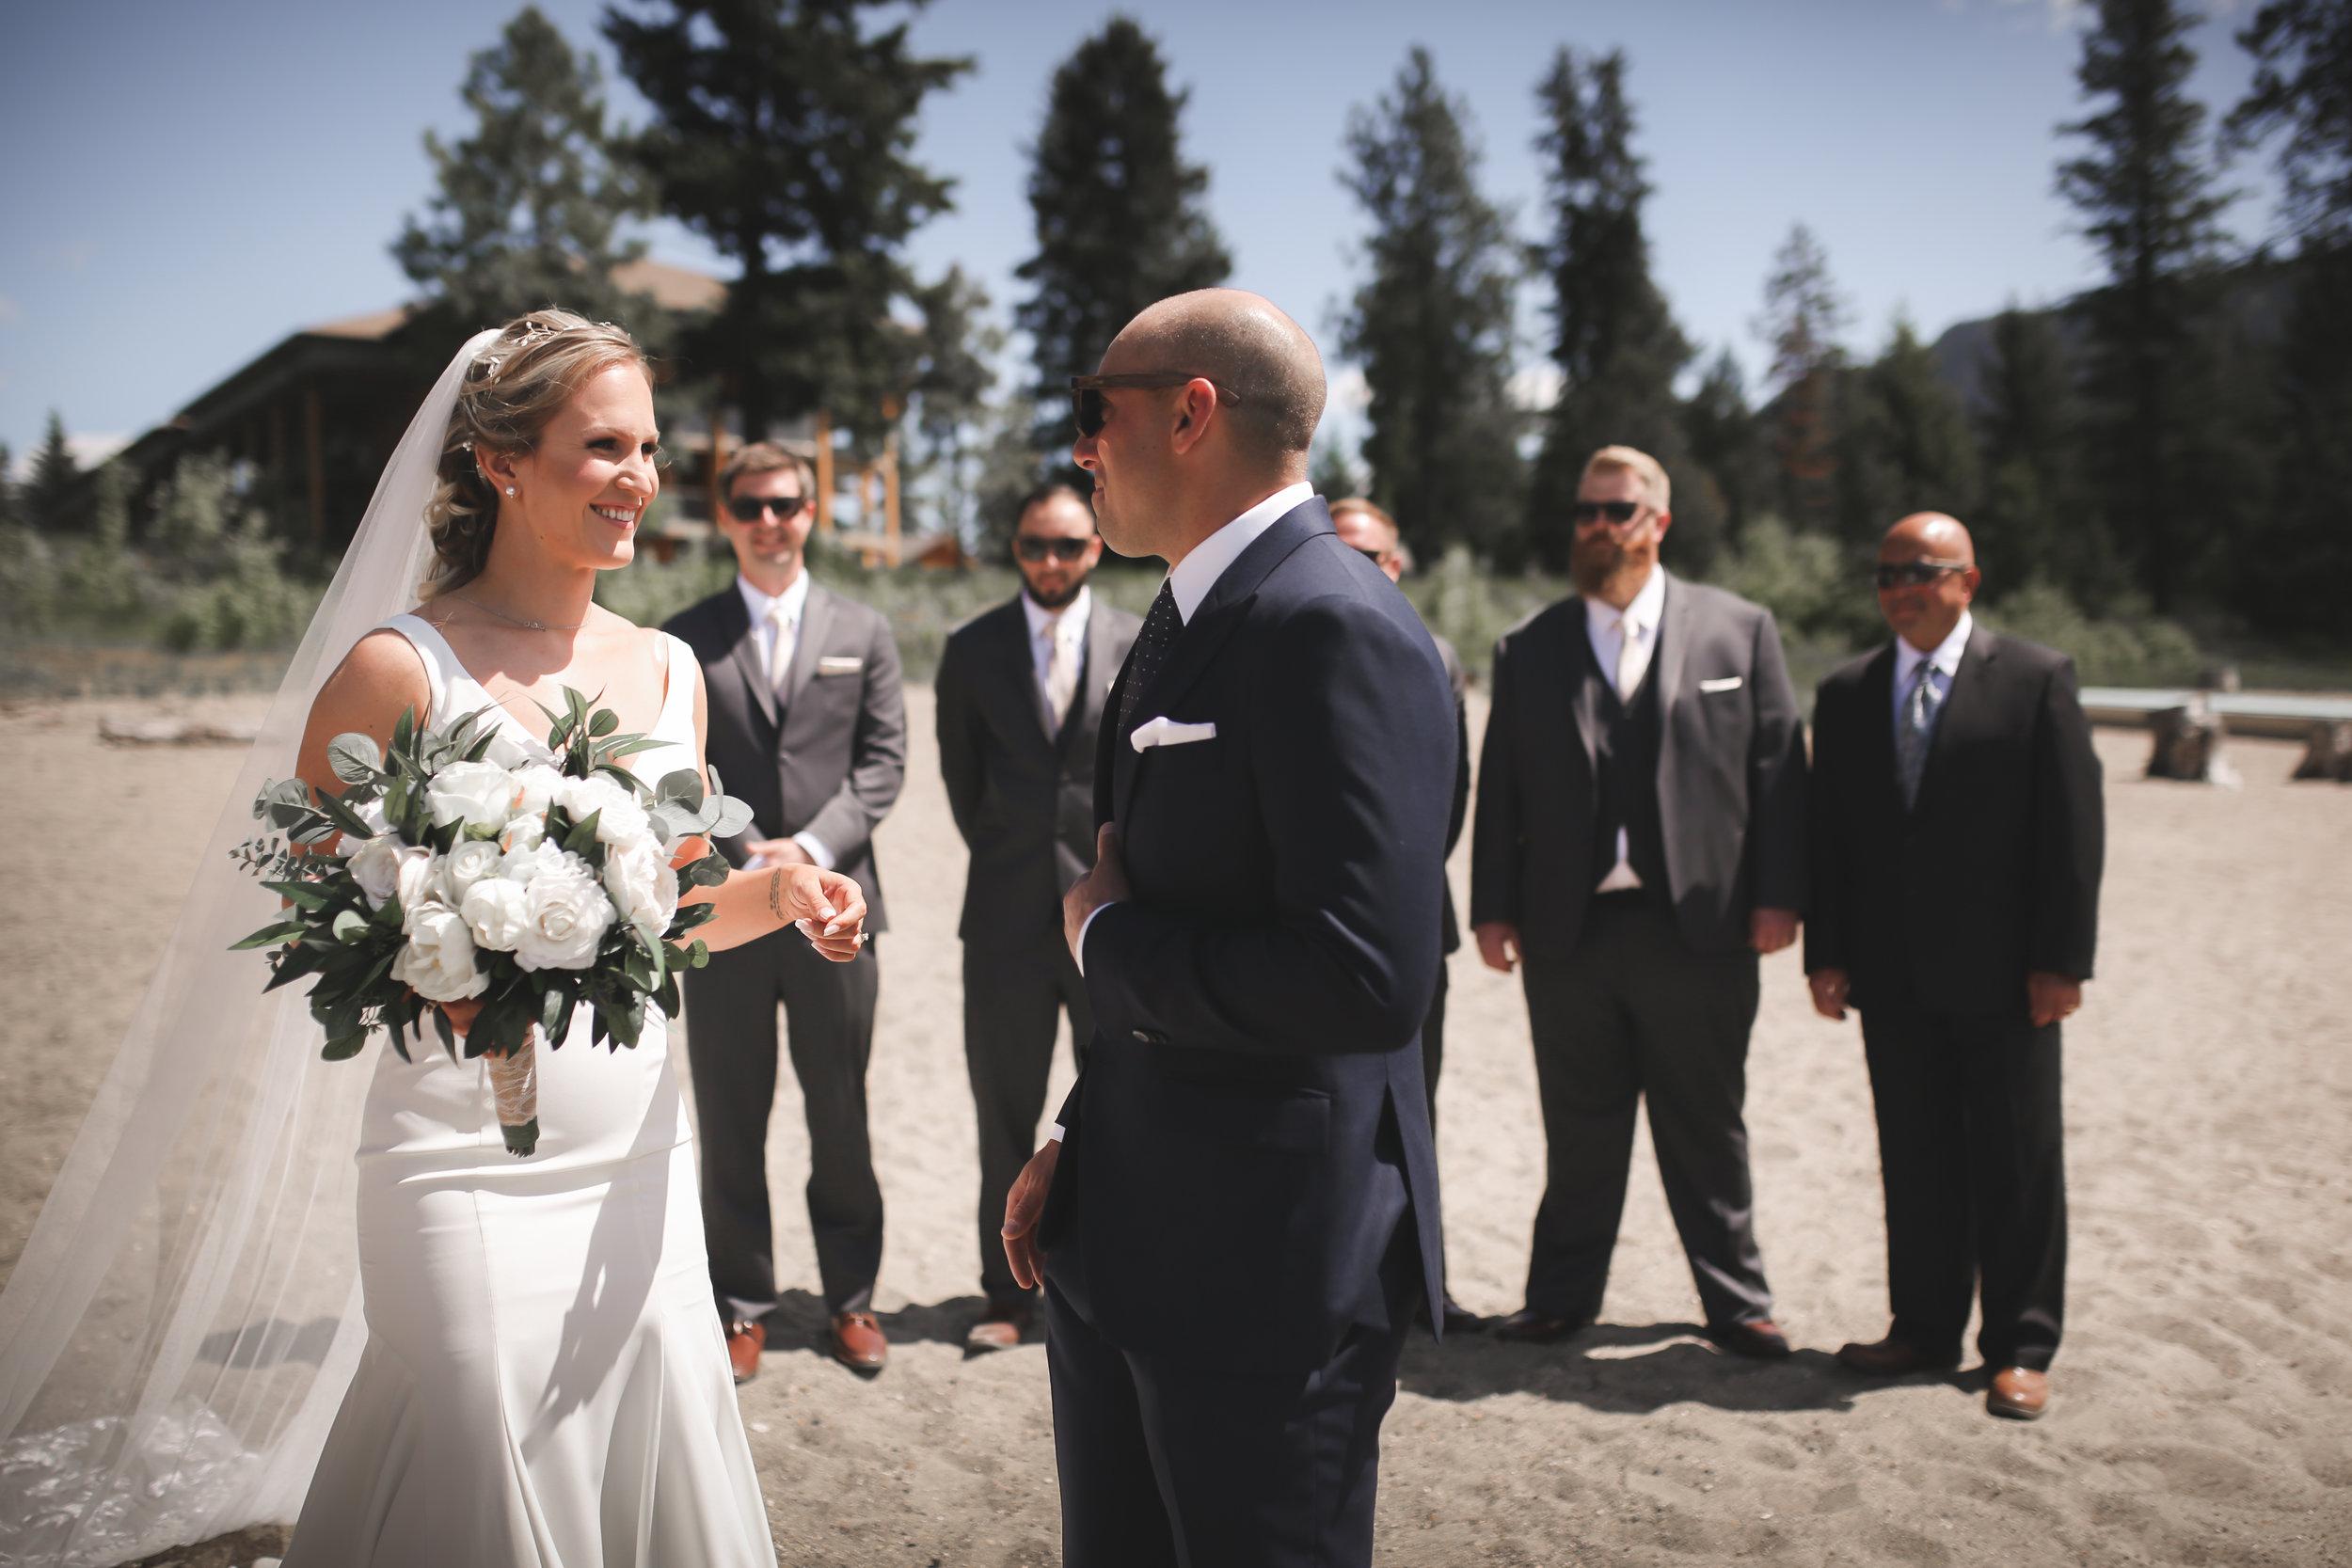 83 Adam Ziorio Photography - Kate & Ben's Wedding.jpg